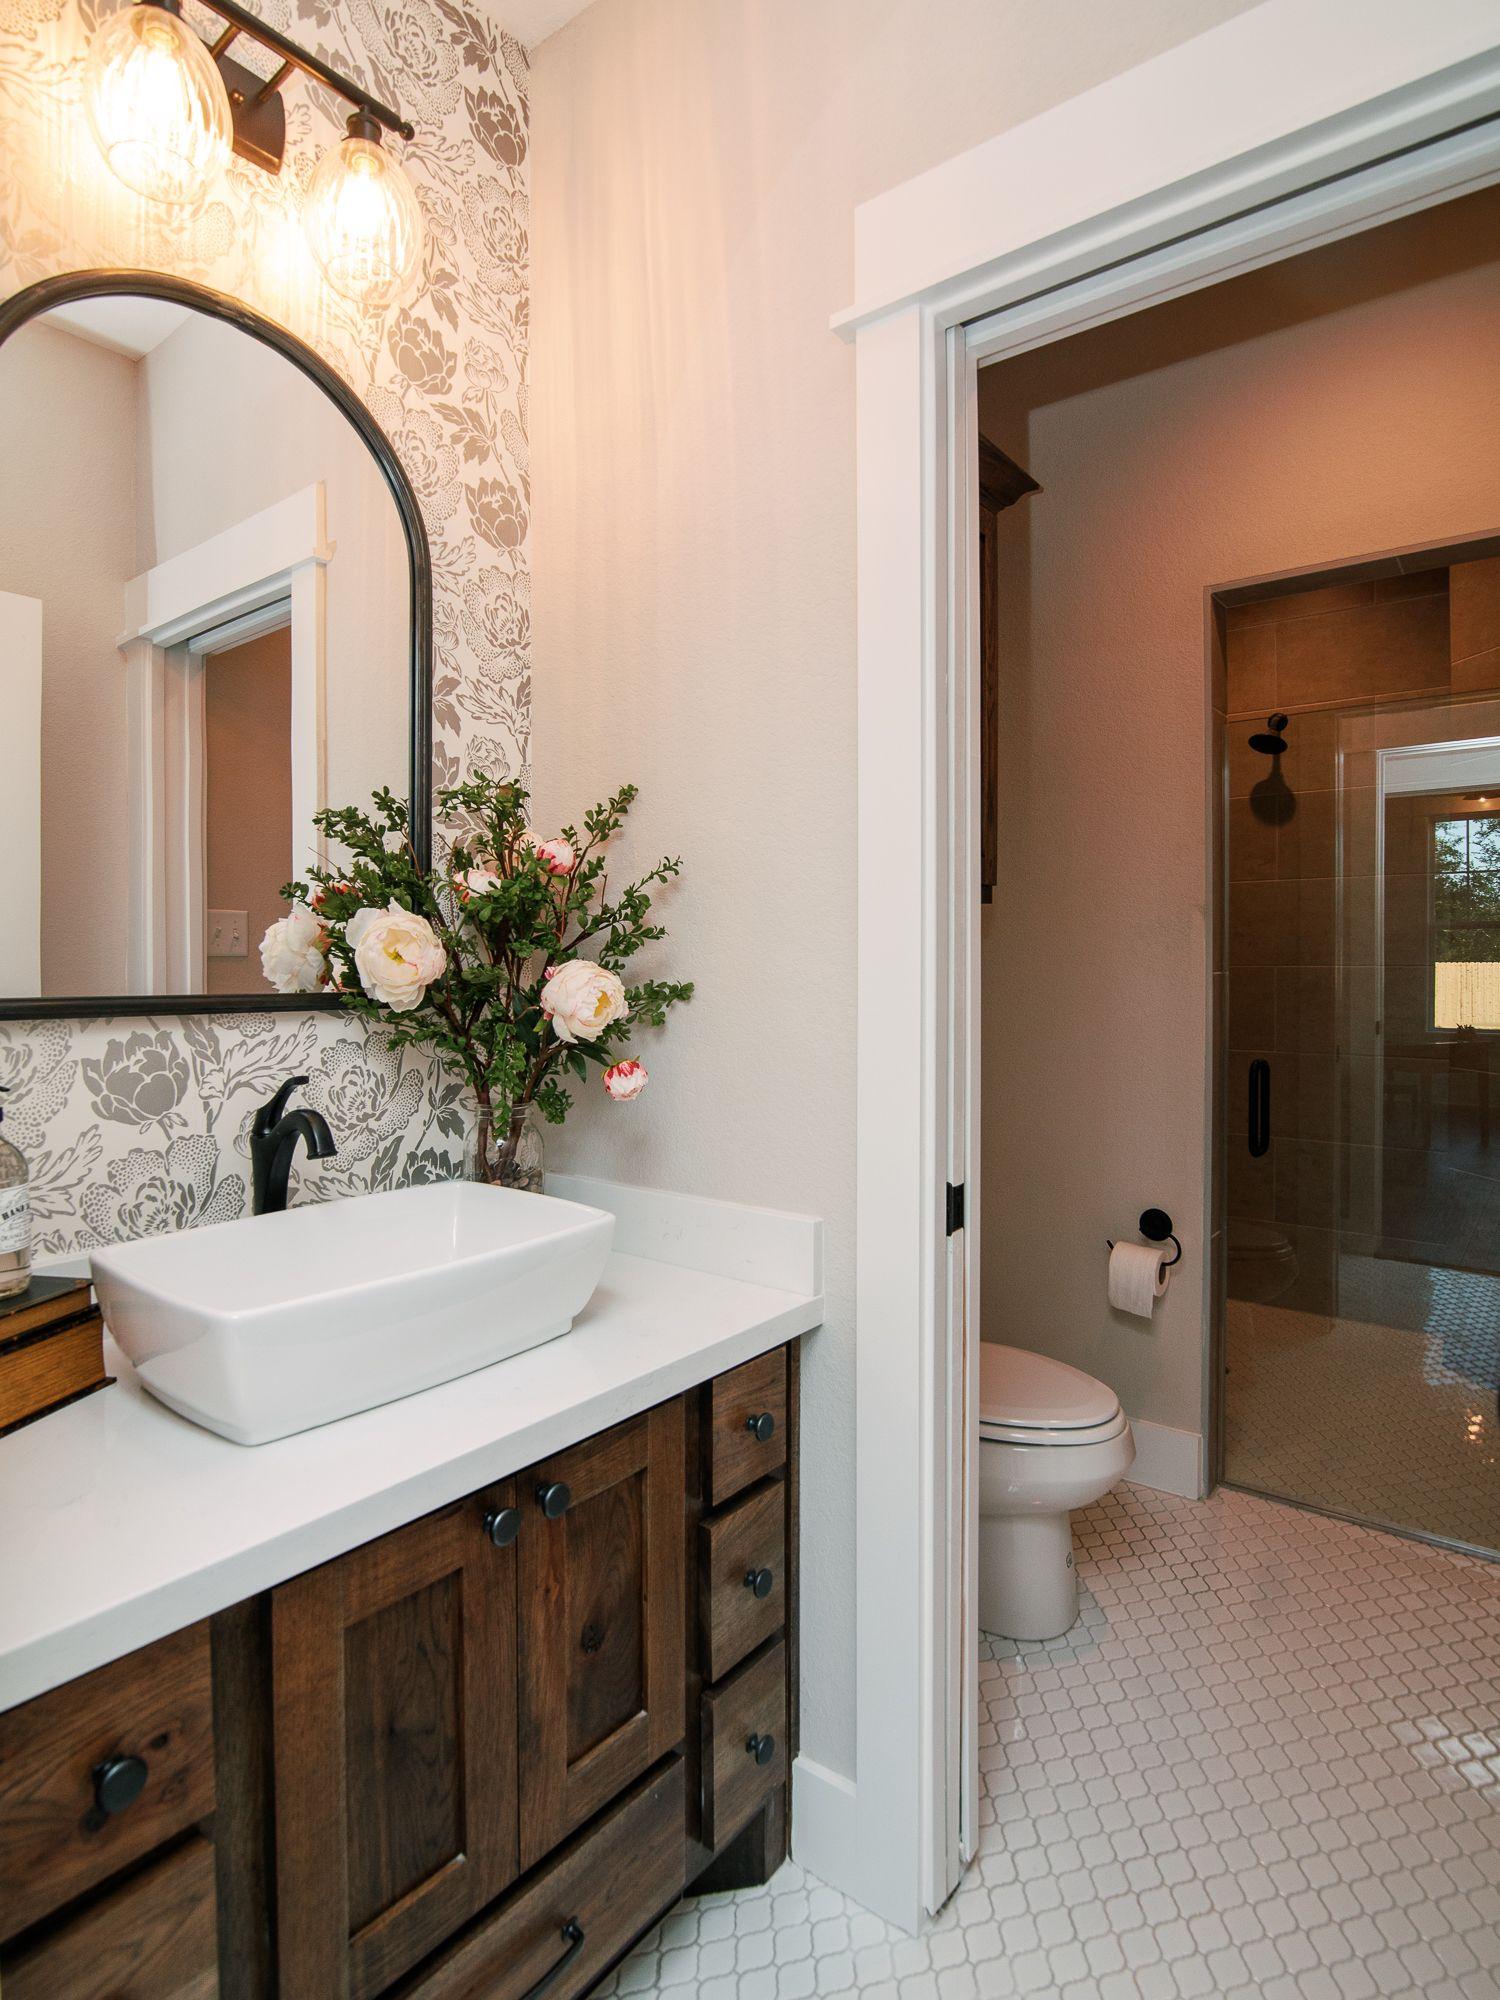 Floral wallpaper in guest bathroom | Bathroom inspiration ...